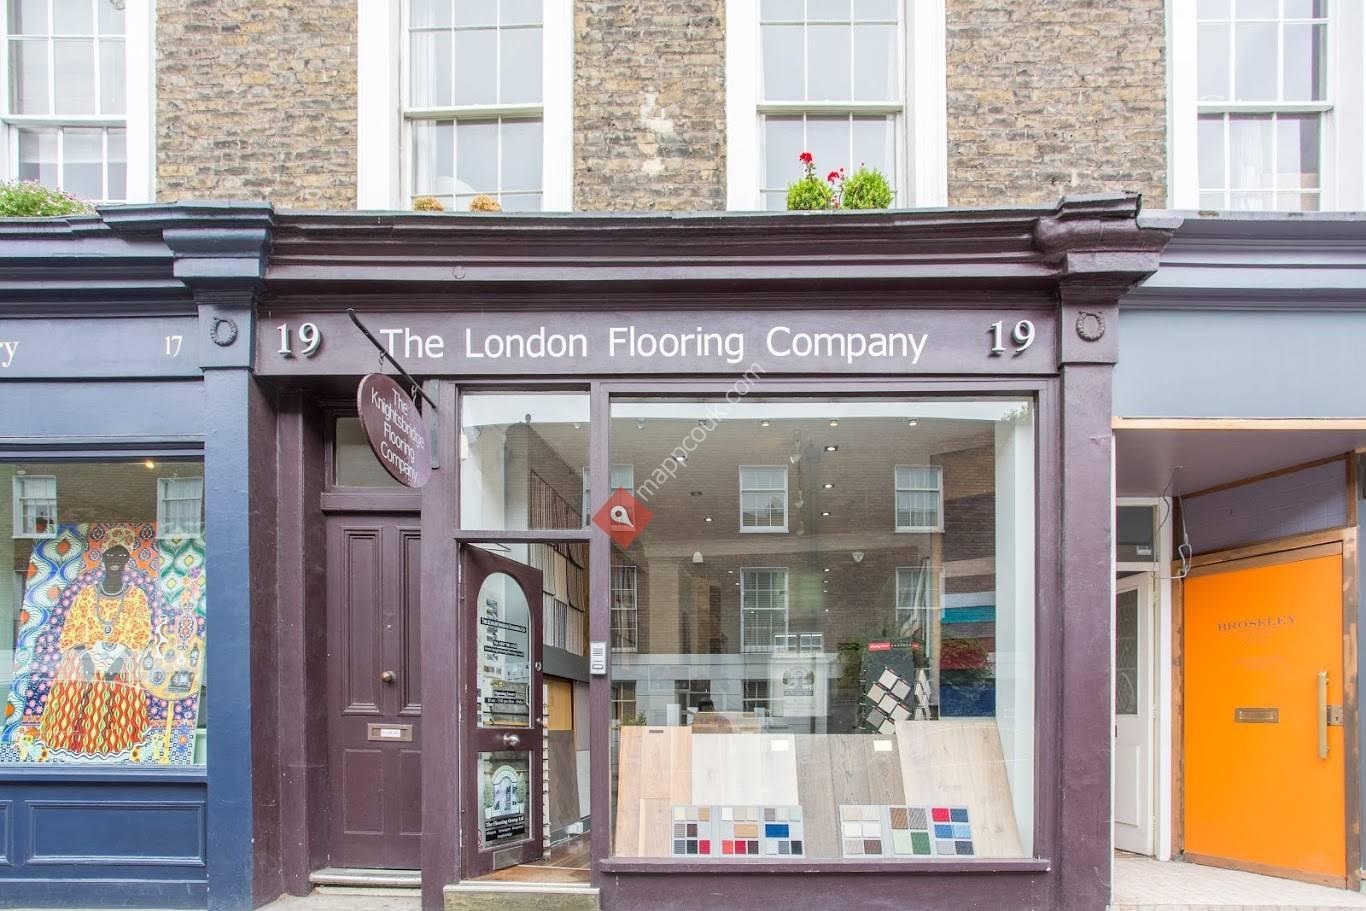 The Knightsbridge Flooring Company